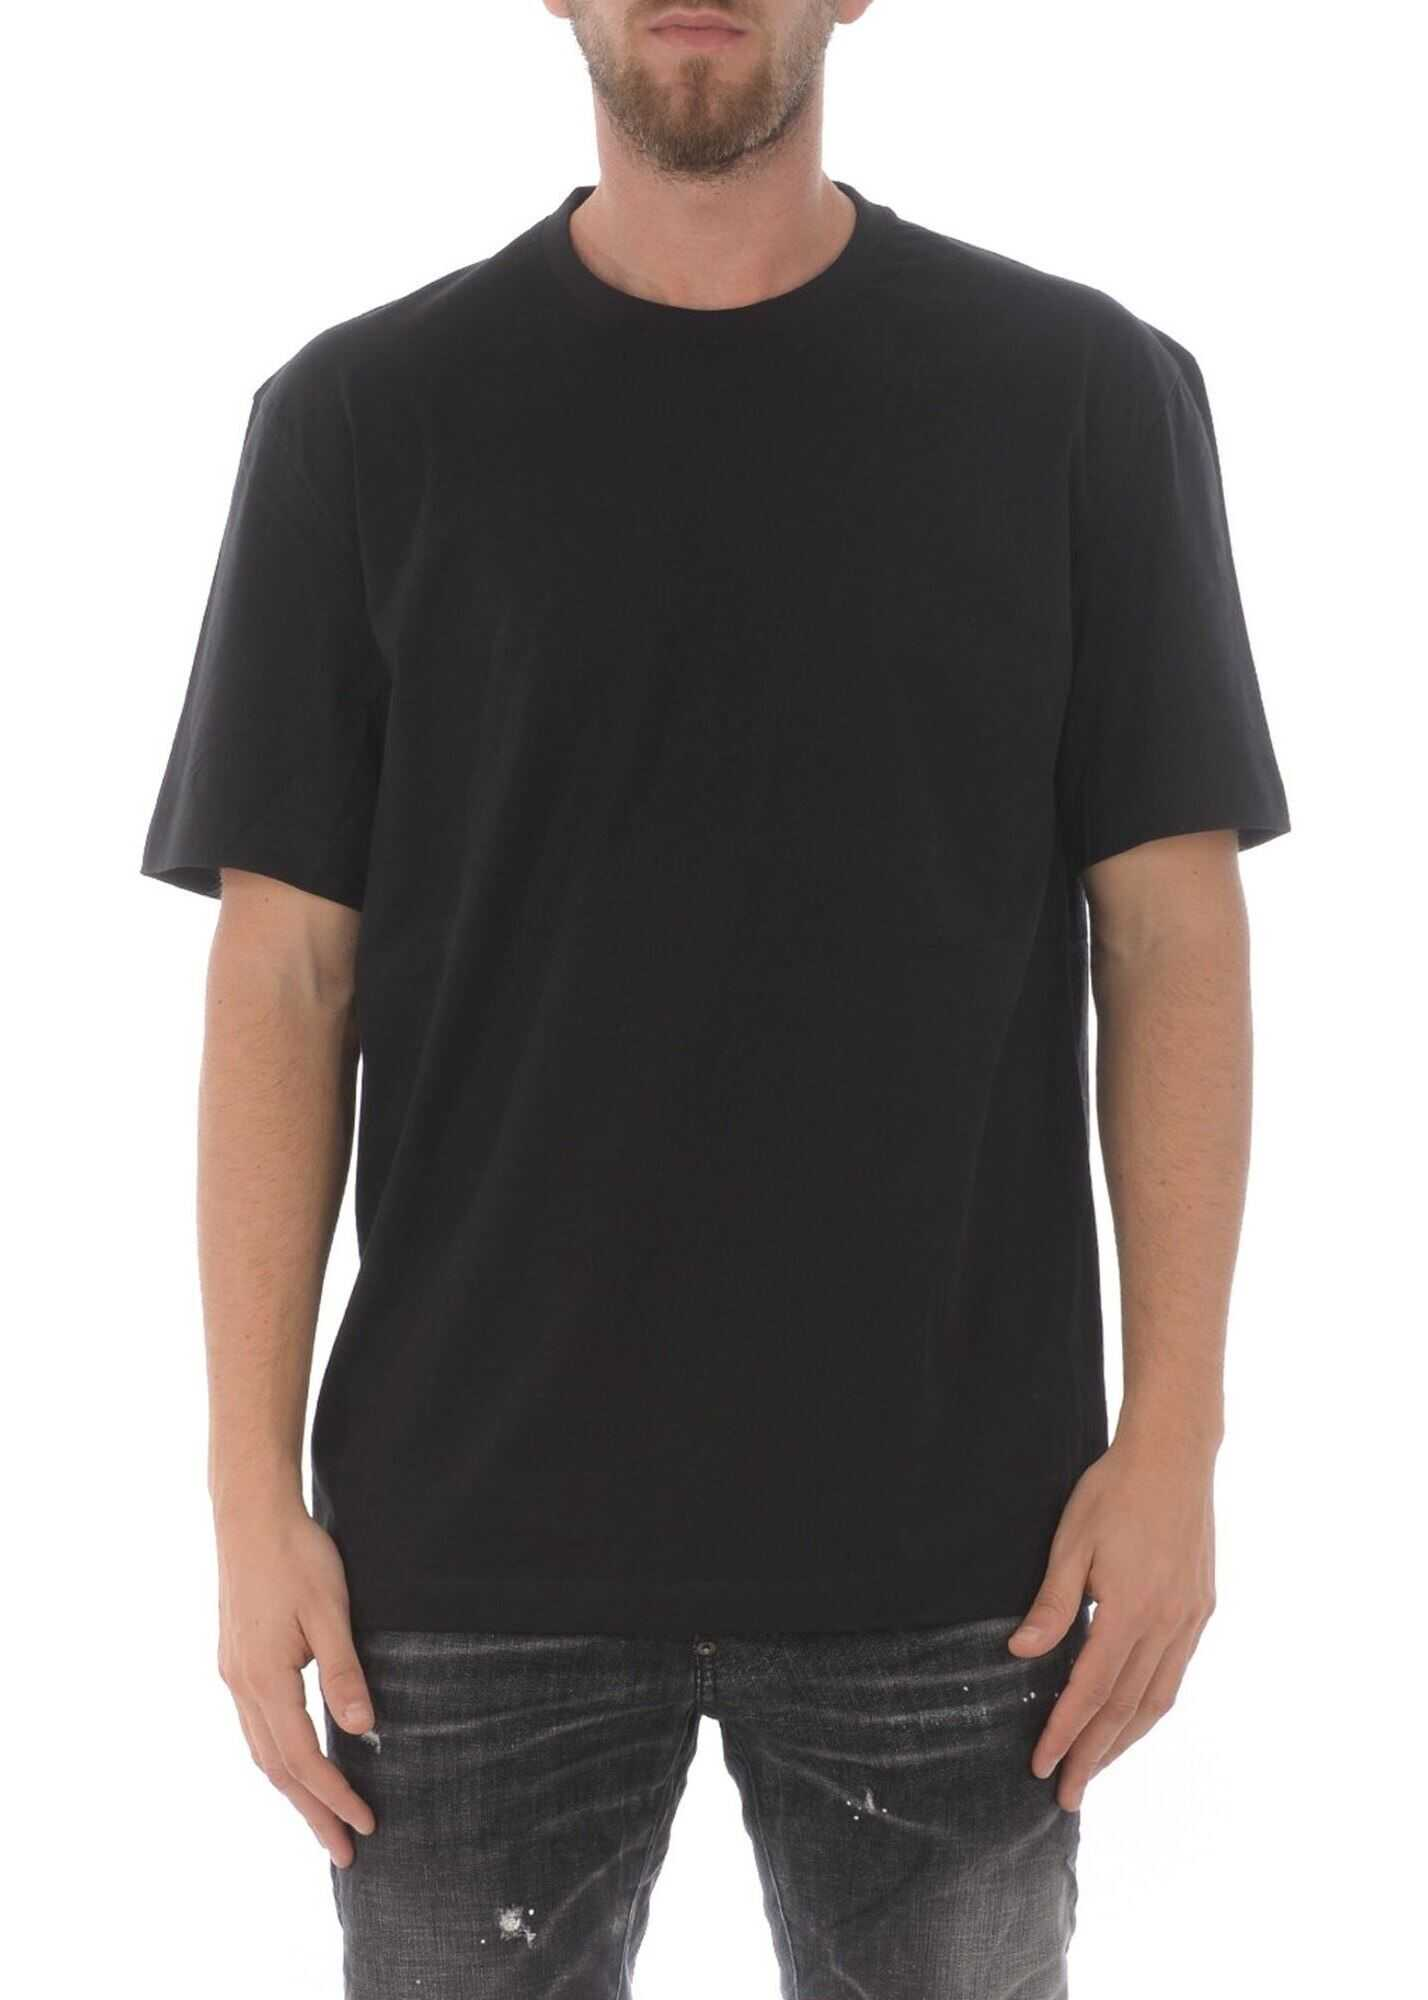 Y-3 Y-3 Print T-Shirt In Black Black